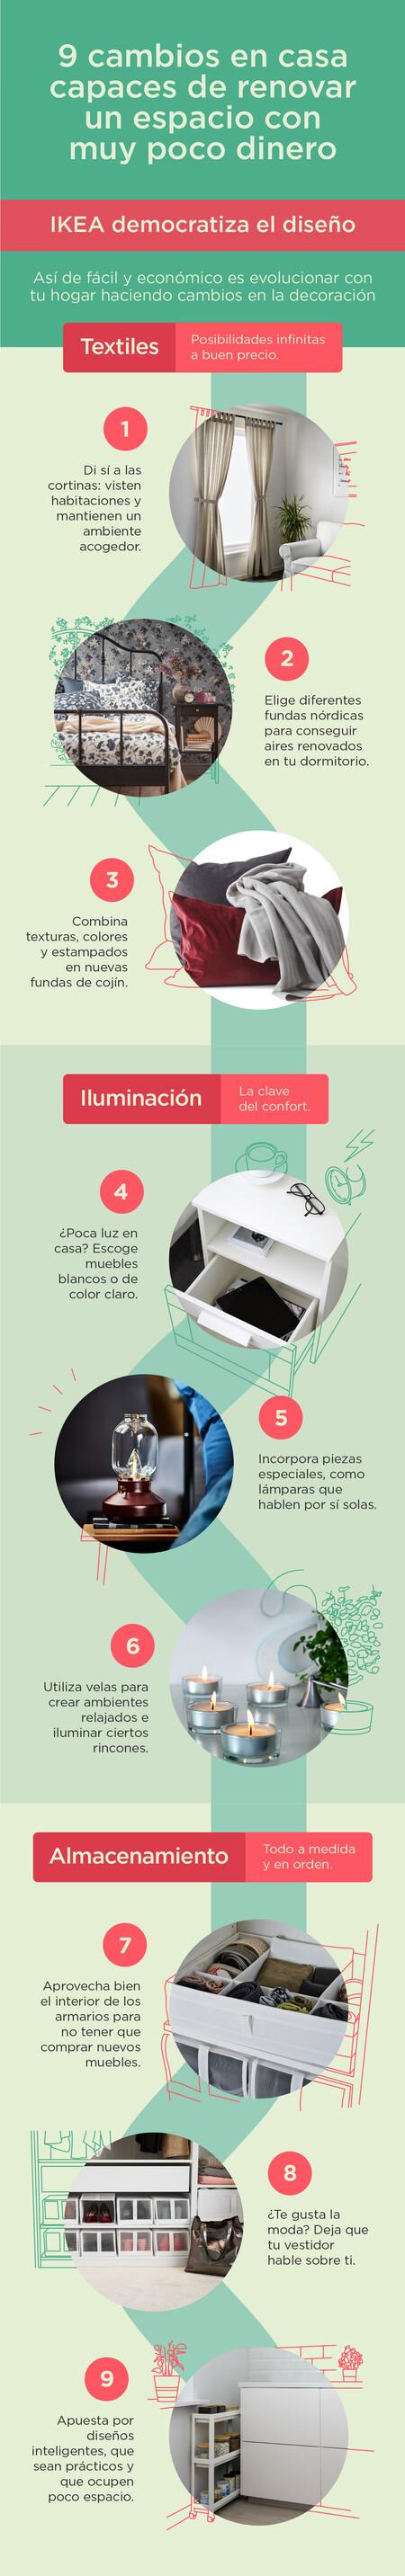 Infografia Ikea Democratizacion Del Diseno 2